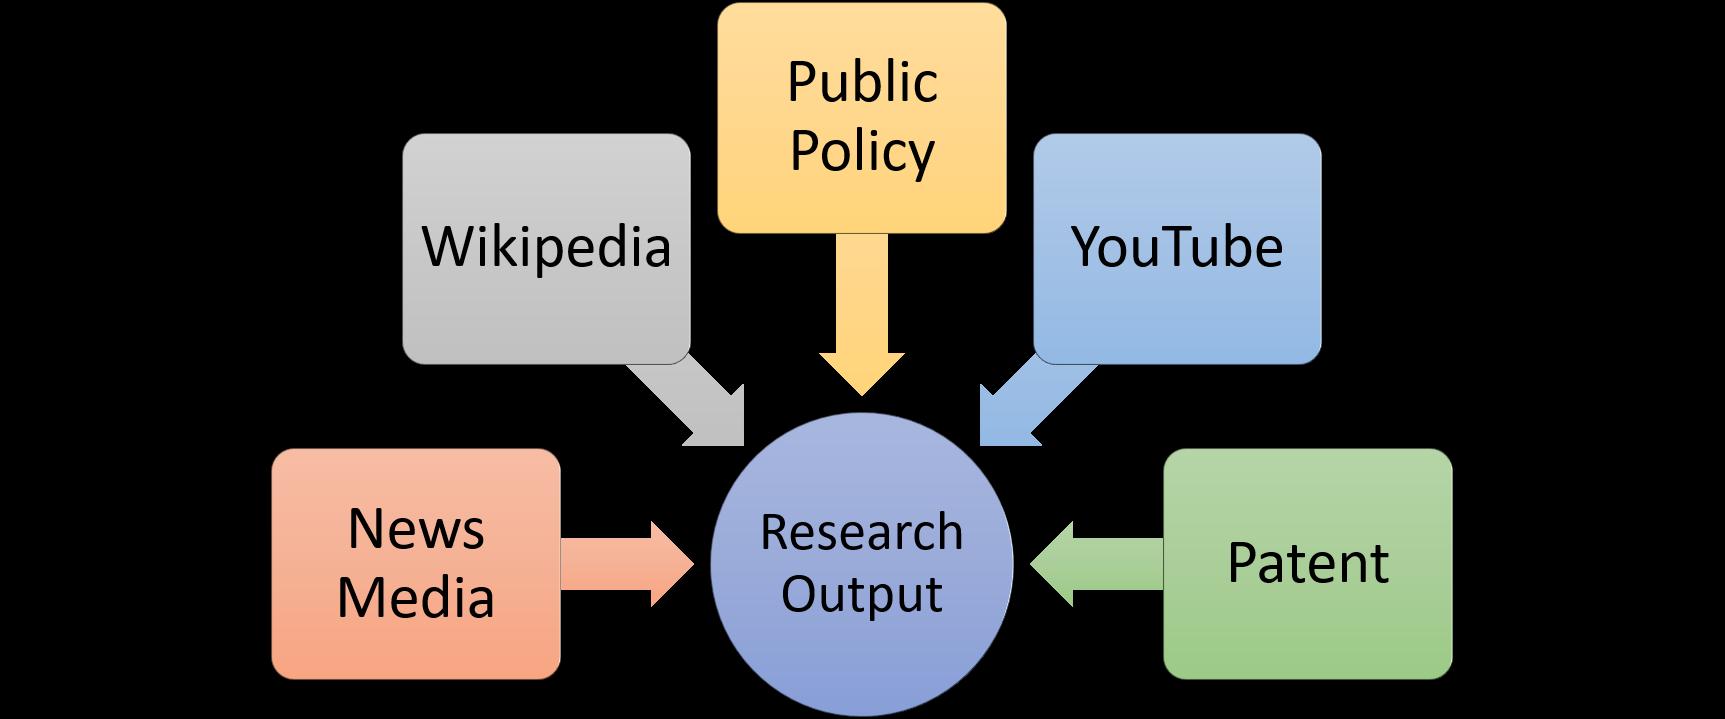 Altmetrics: Explore your Research Impact beyond Academia